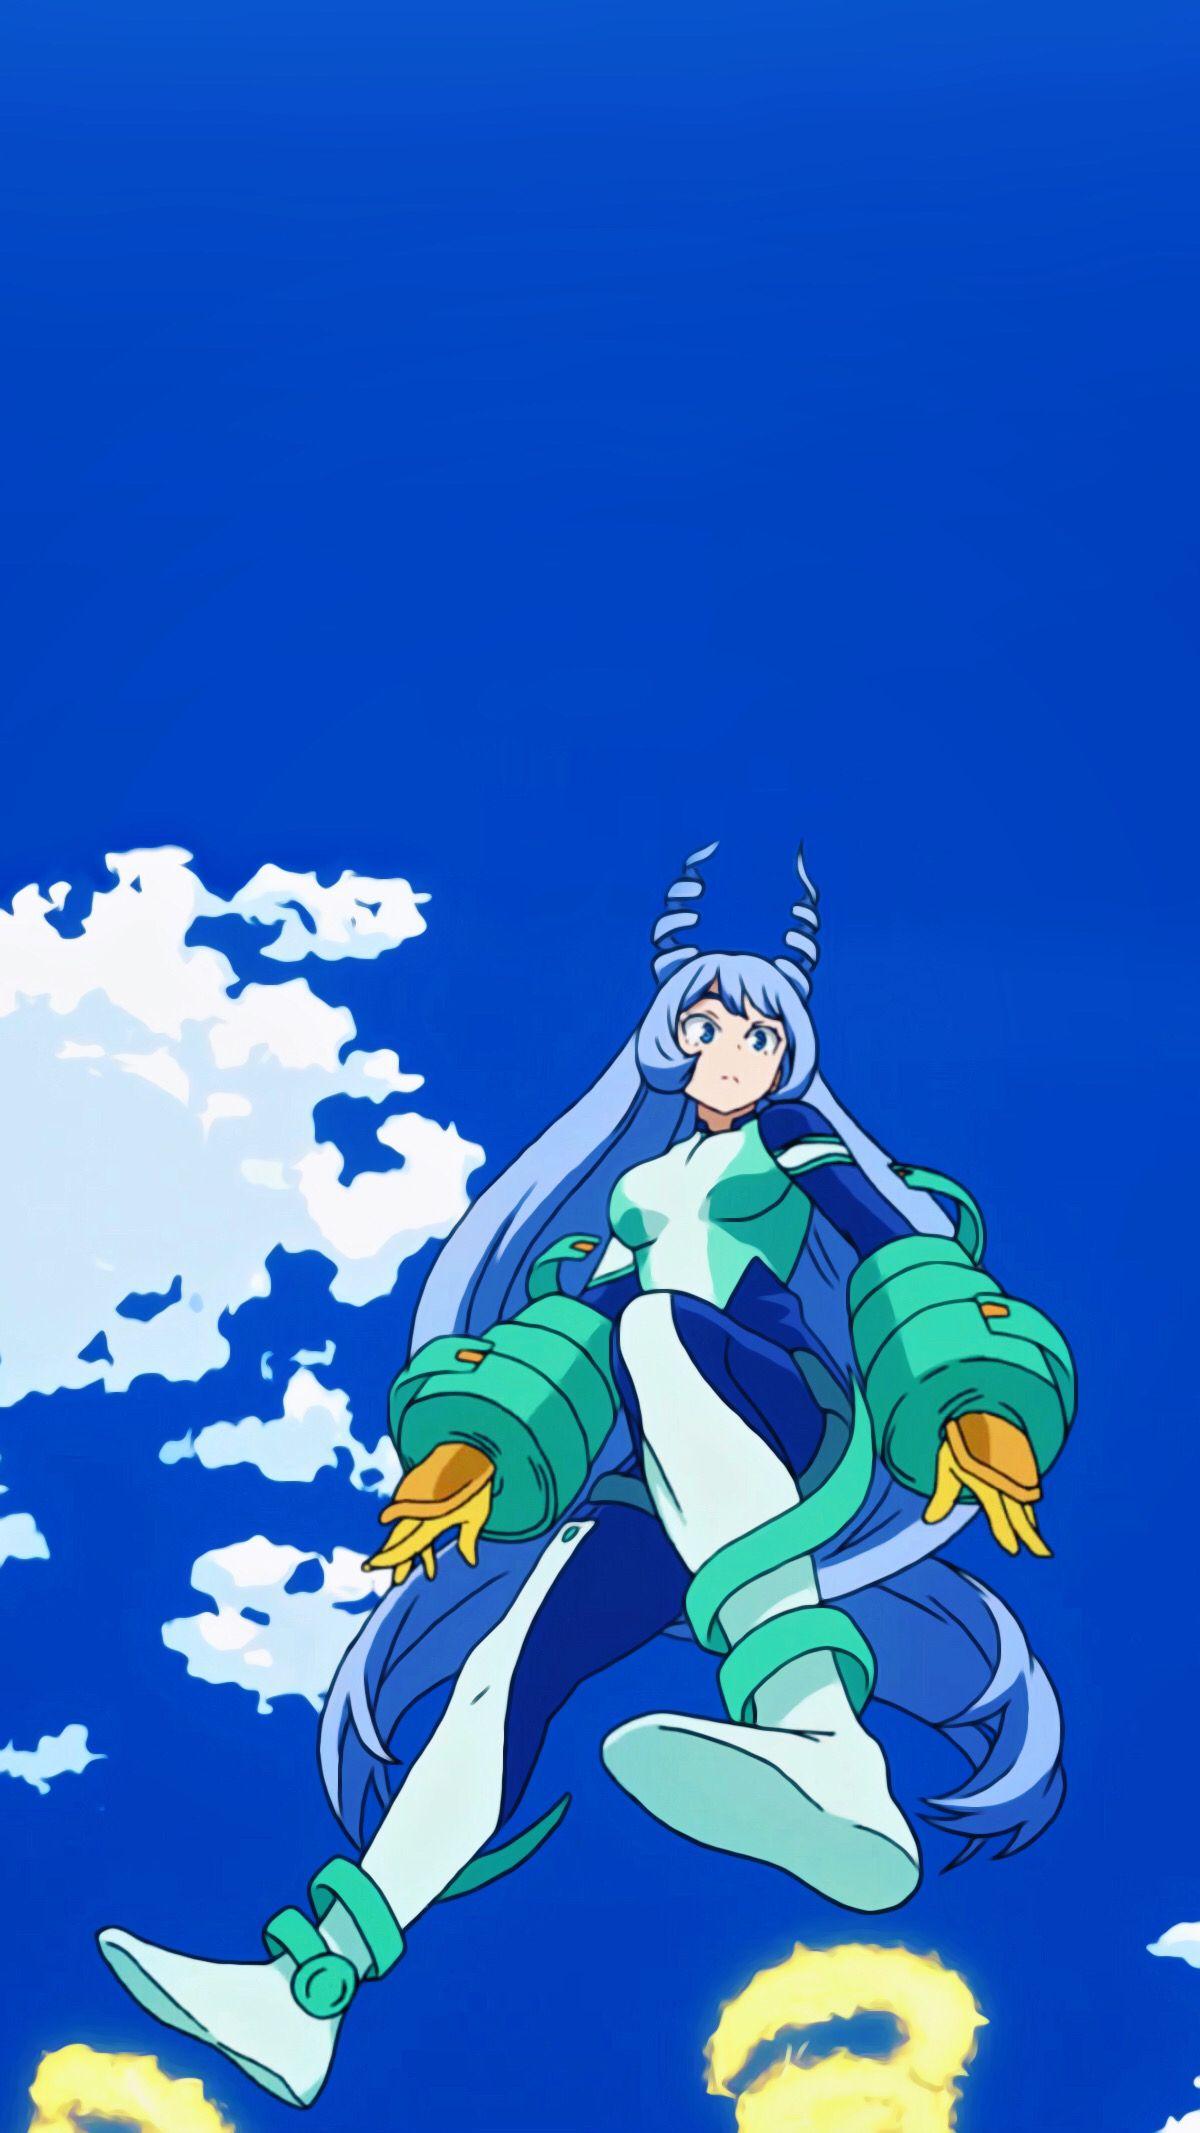 Nejire Hado Aesthetic Wallpaper Anime Character Drawing Hero Academia Characters Kawaii Anime